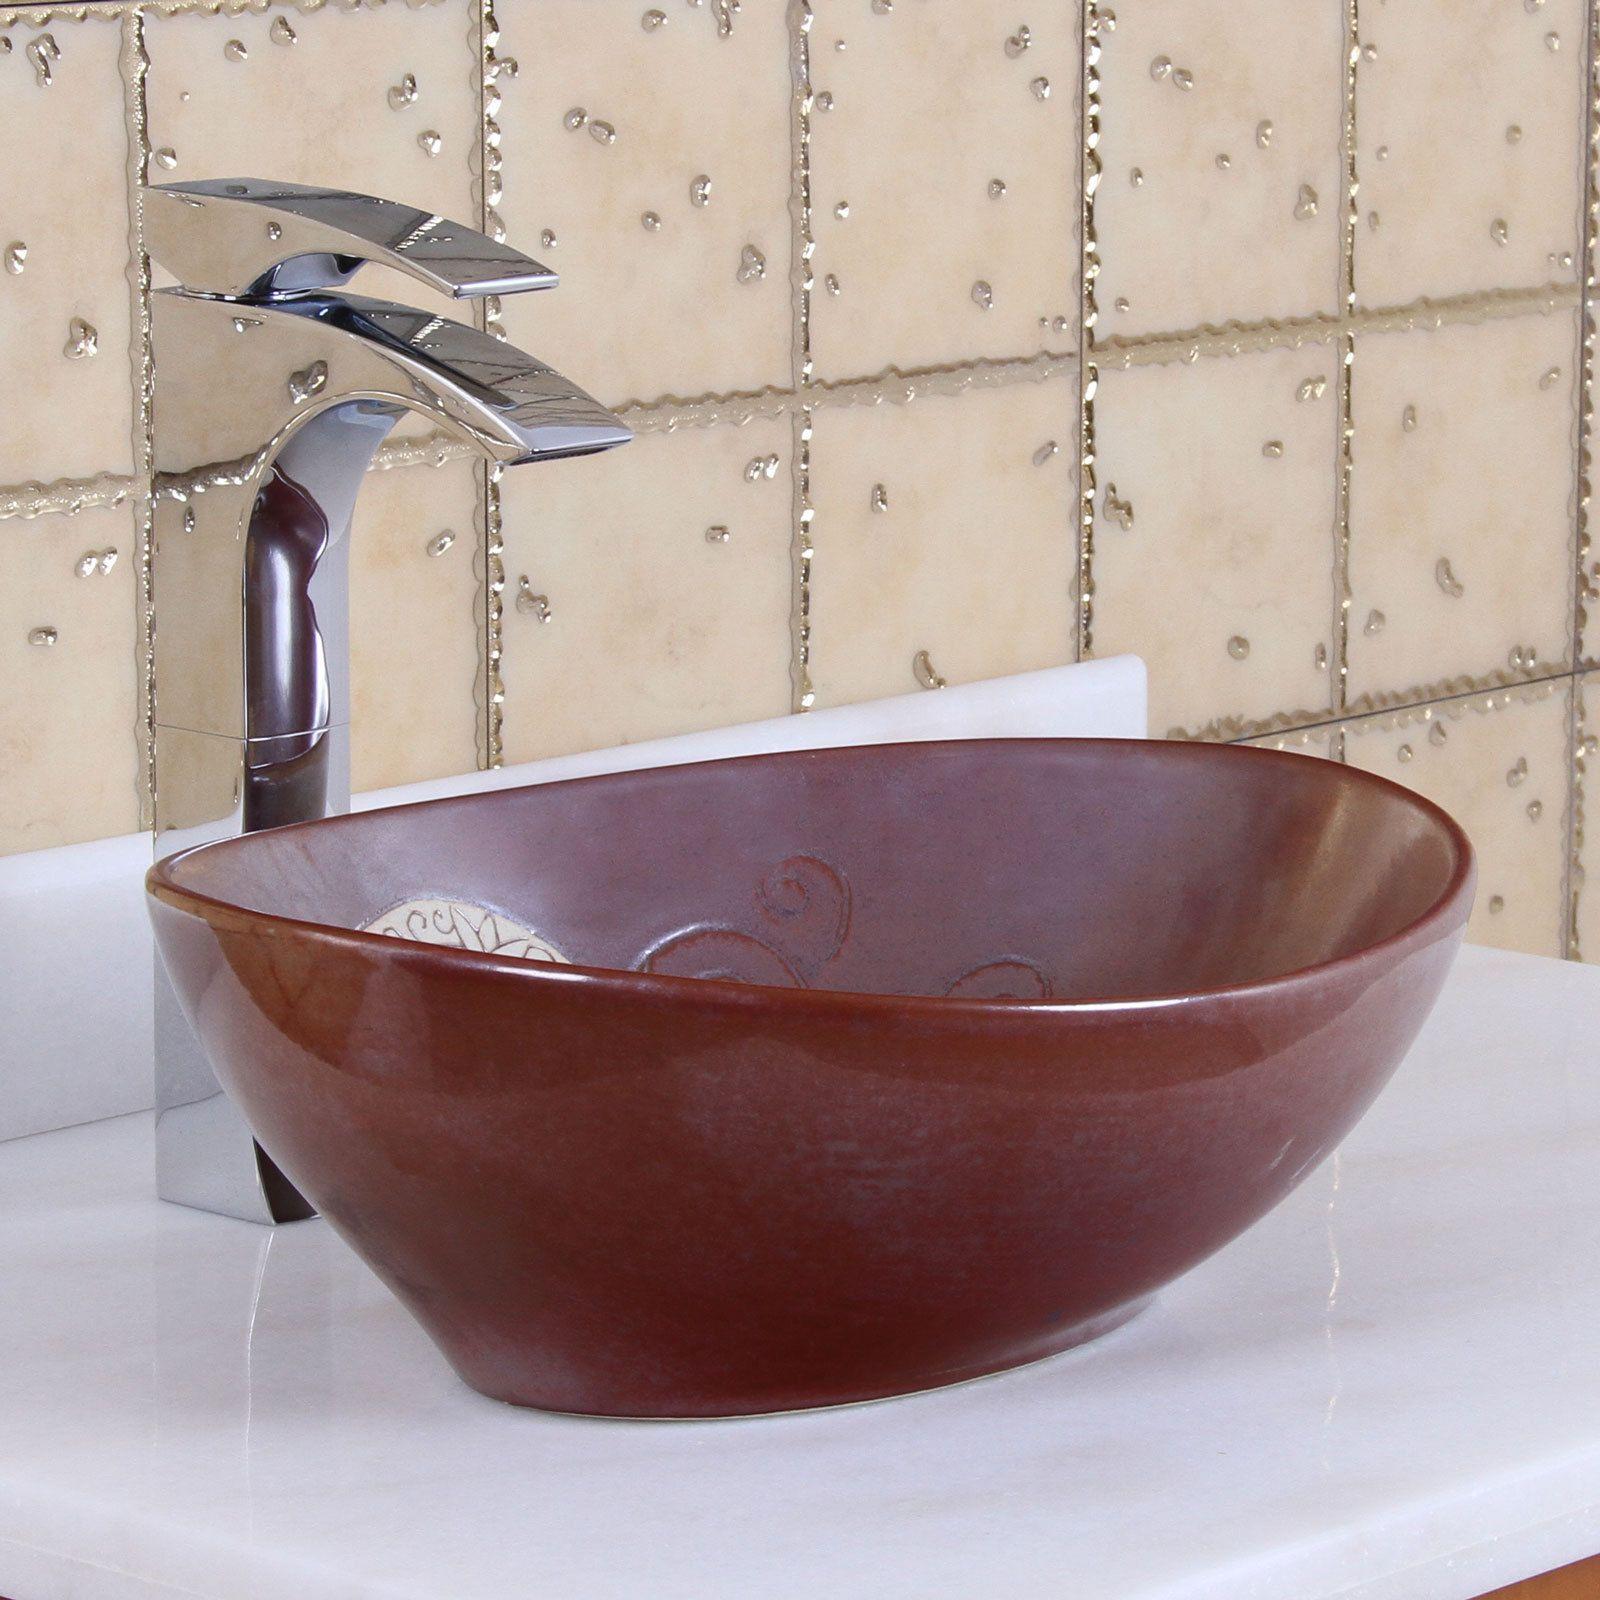 Charmant Elite 1566 Oval Mohogany Glaze Porcelain Ceramic Bathroom Vessel Sink  (Ceramic Sink), Grey